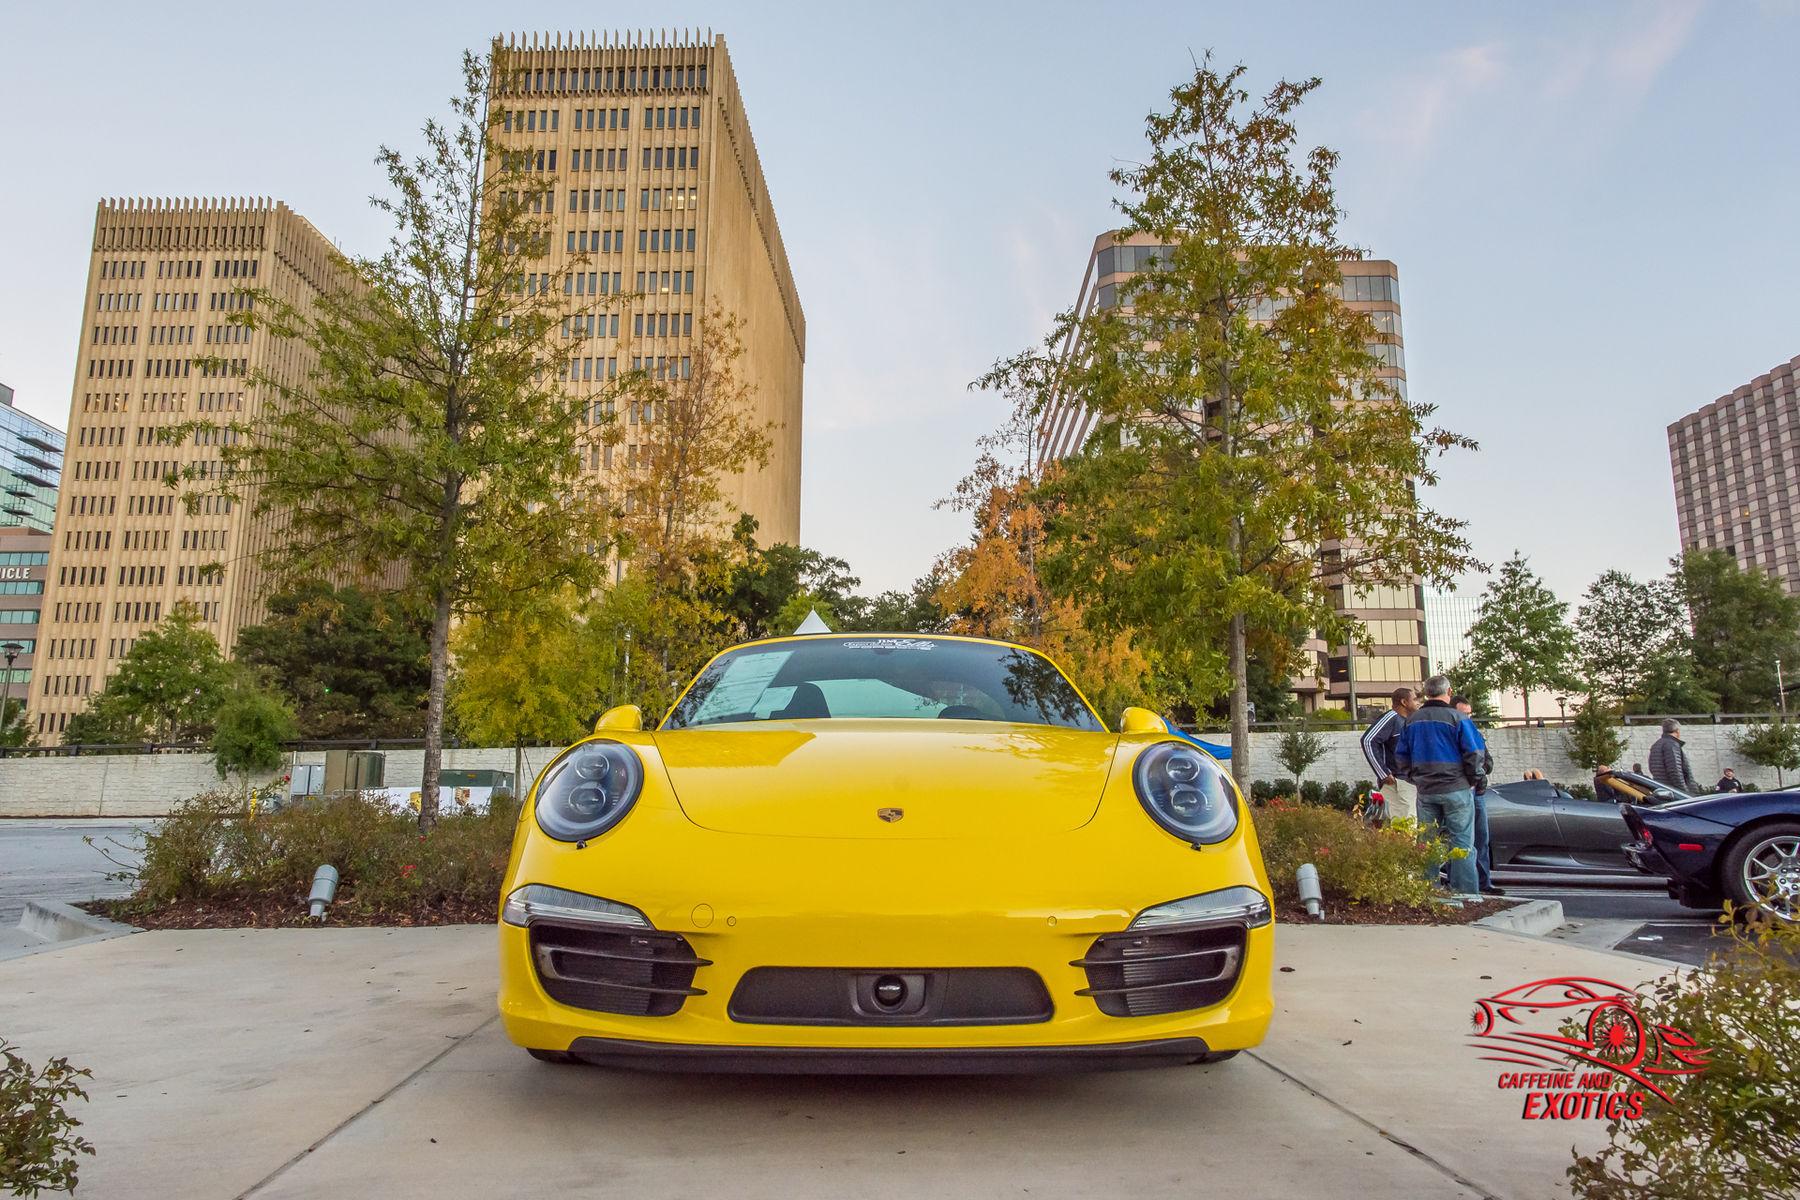 2015 Porsche 911   Yellow Porsche Head-On